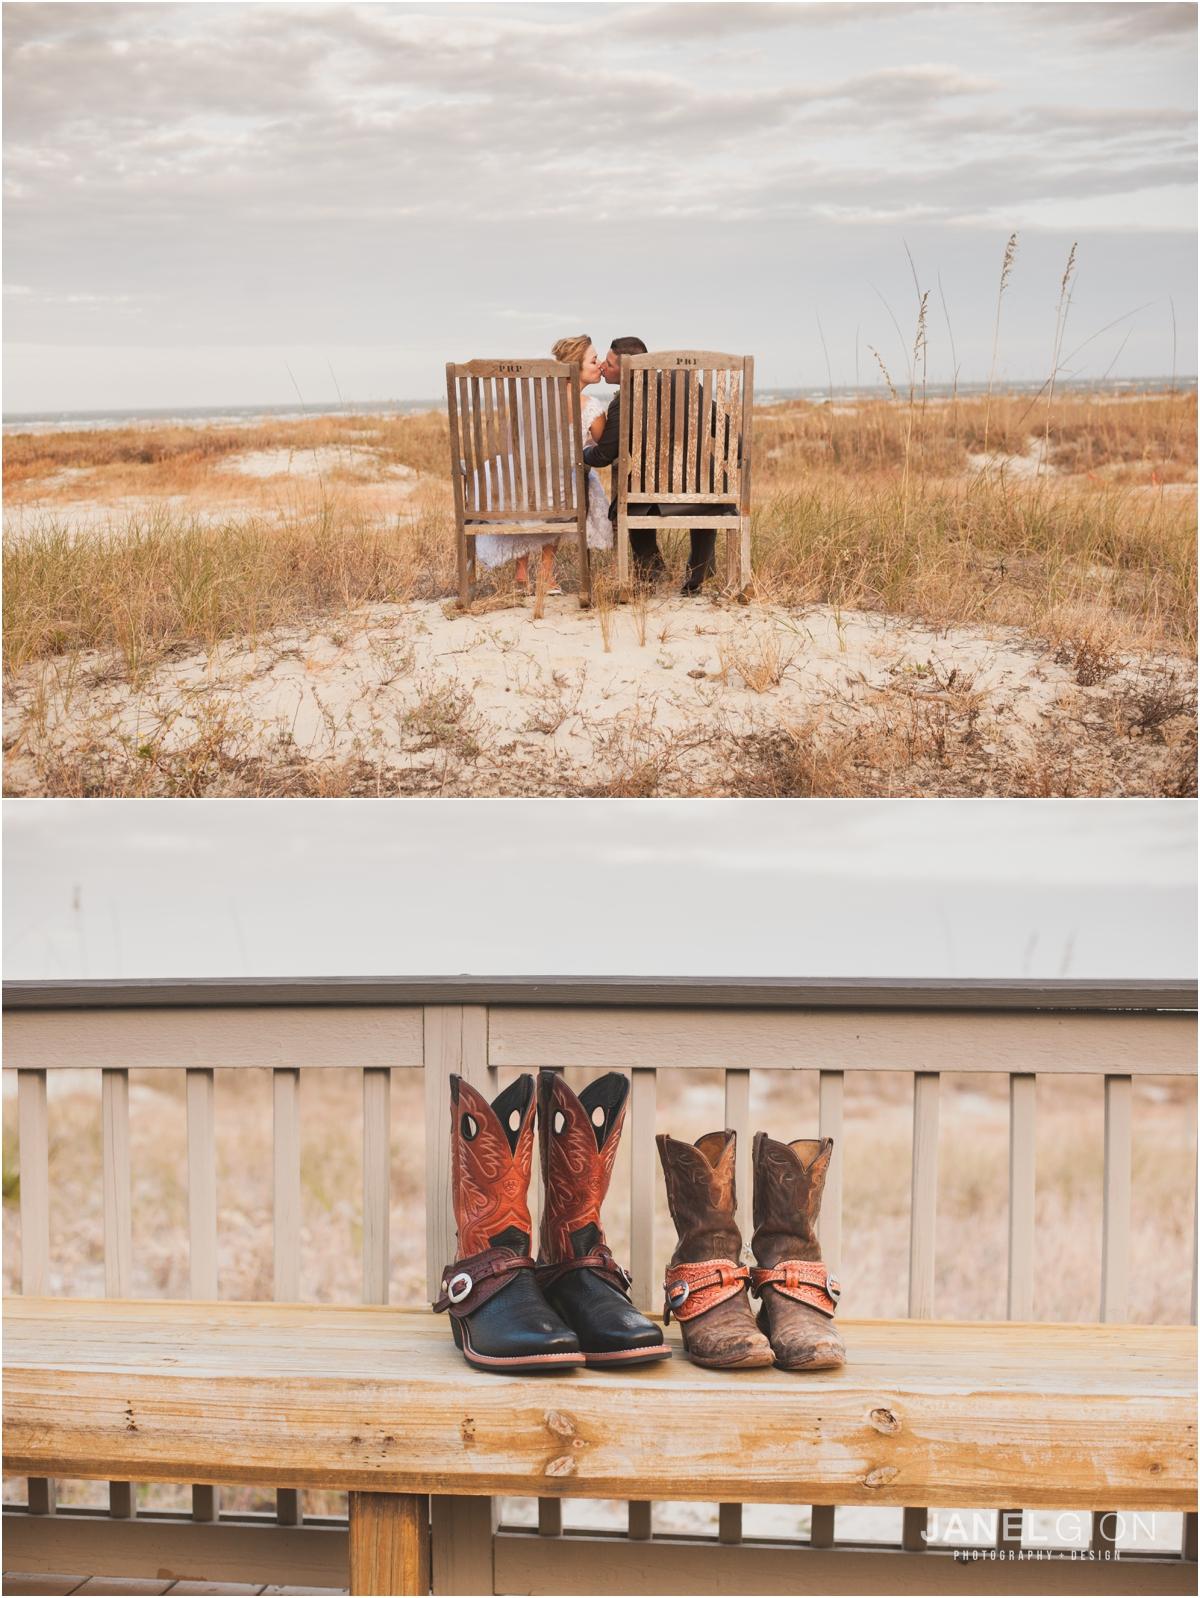 Janel-Gion-Hilton-Head-Island-SC-Destination-Wedding-Photographer_0033